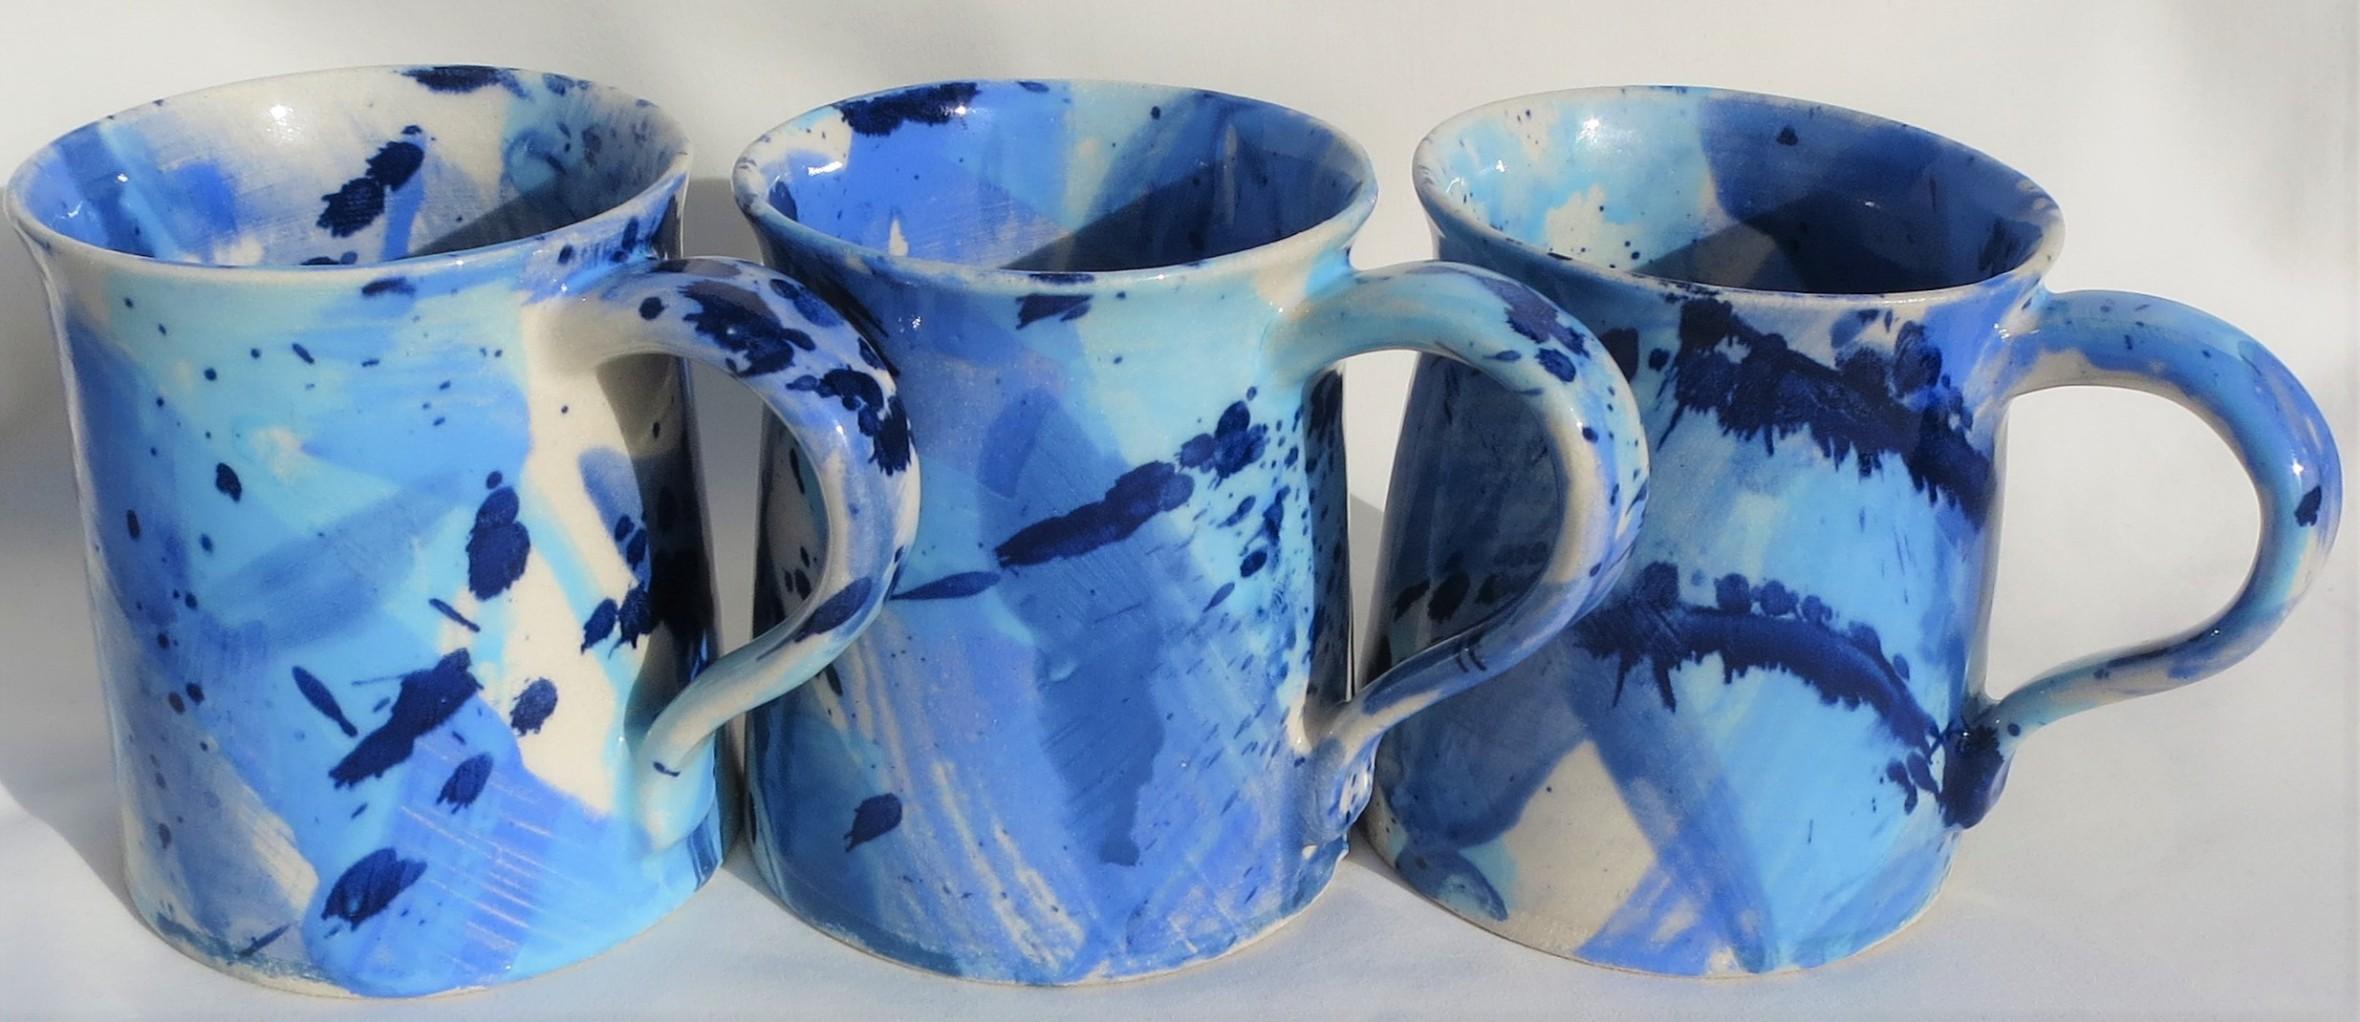 Splash Blue Mugs x 3 (2)